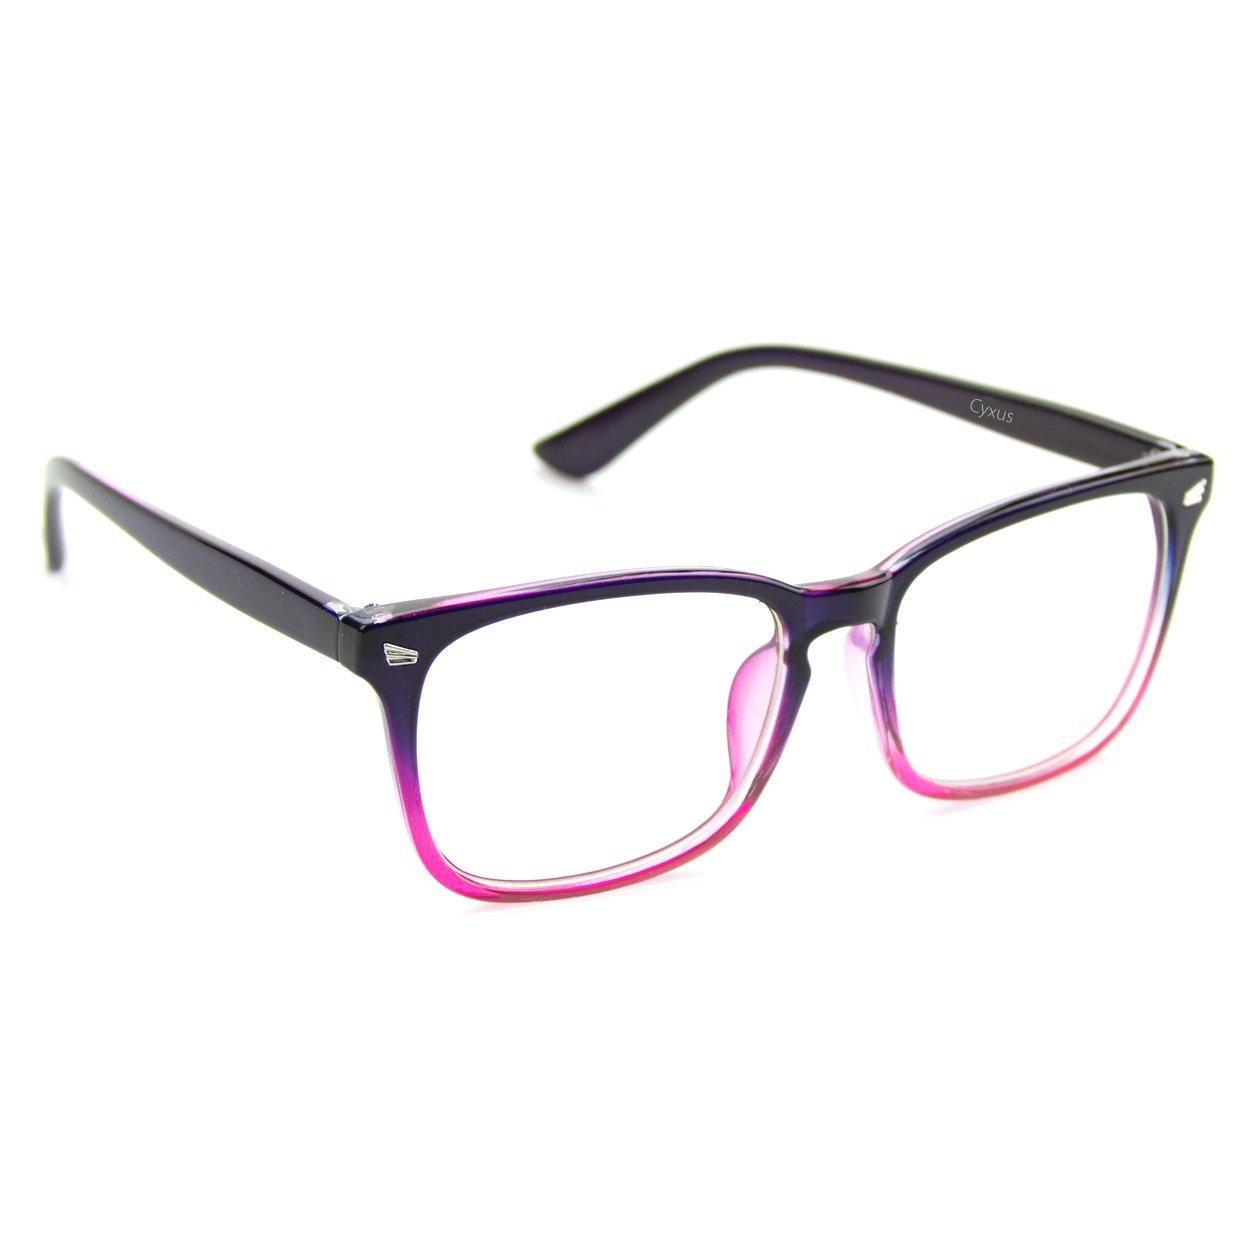 Amazon.com: Cyxus Blue Light Filter [Transparent Lens] Glasses ...